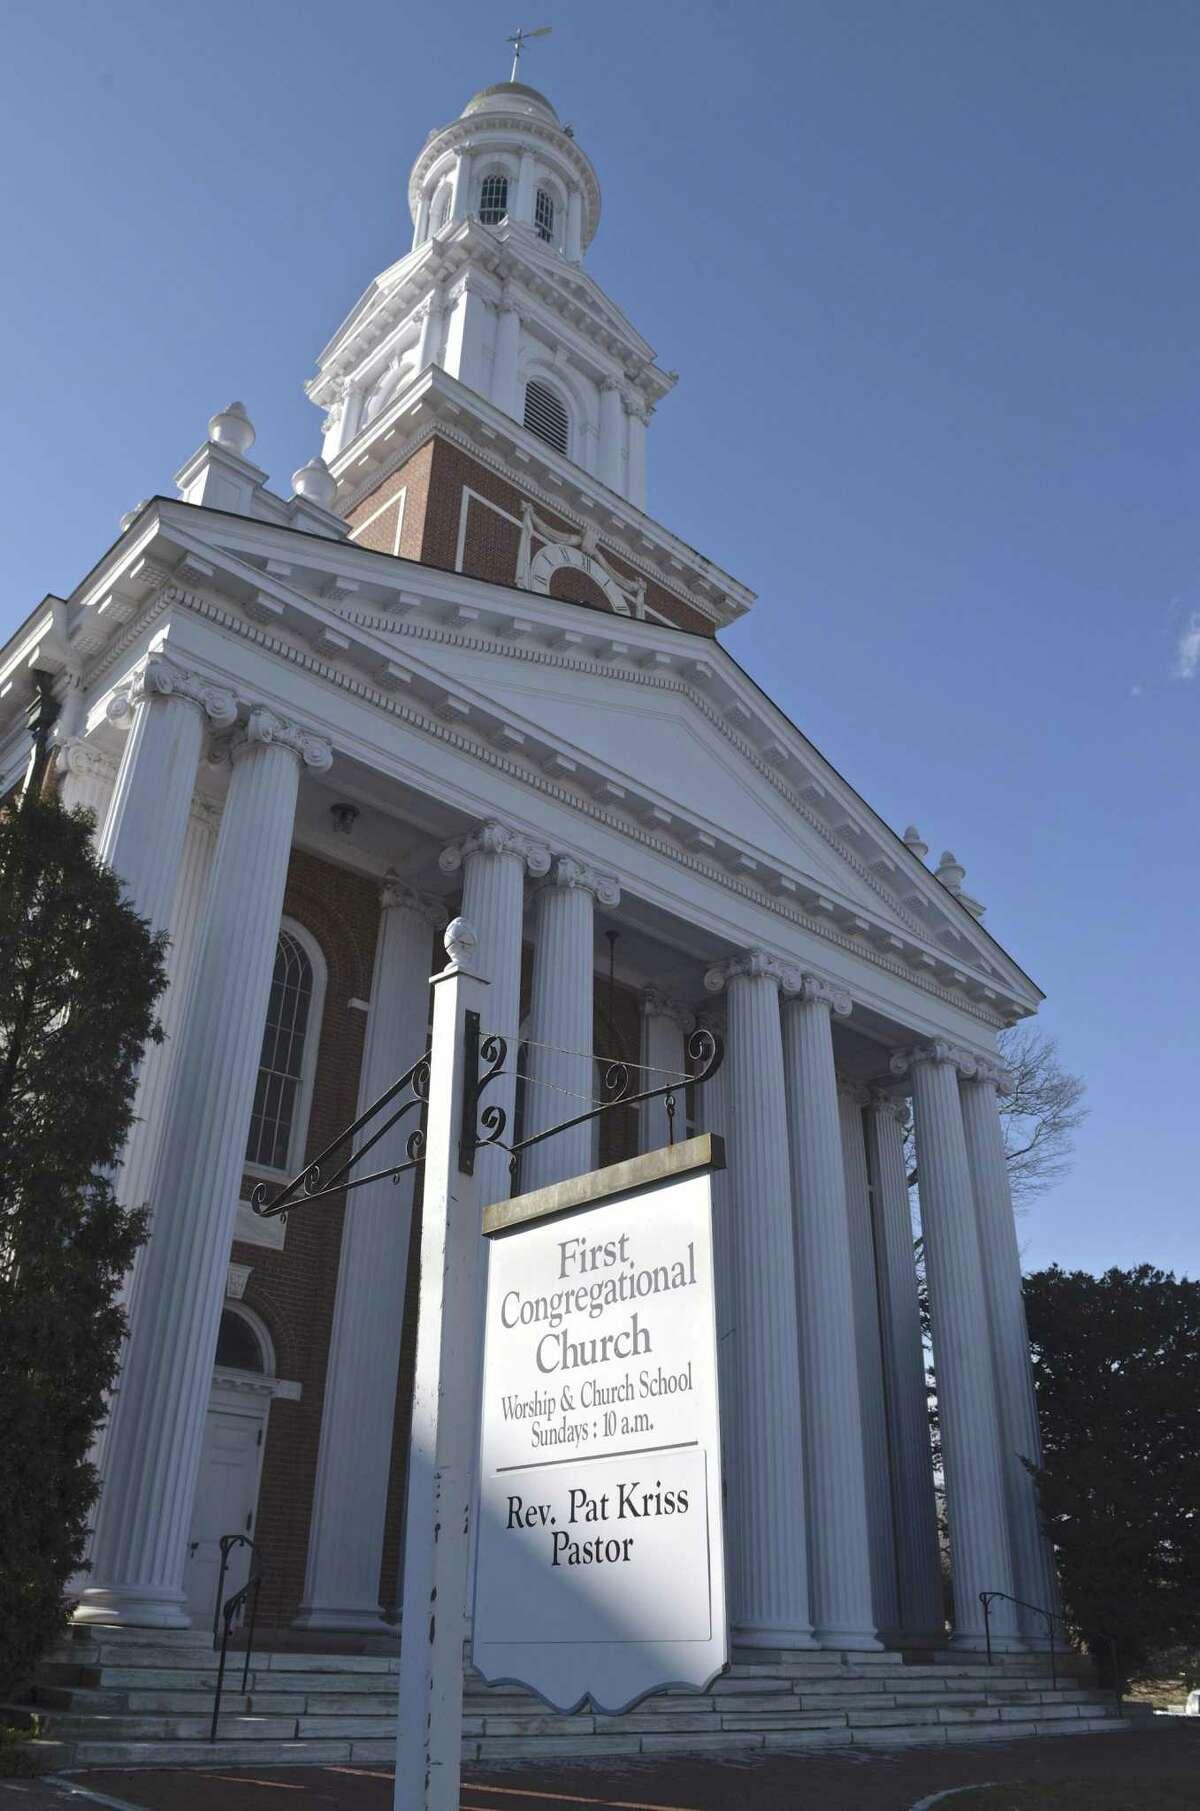 First Congregational Church United Church of Christ, Danbury, Conn. Wednesday, January 30, 2019.